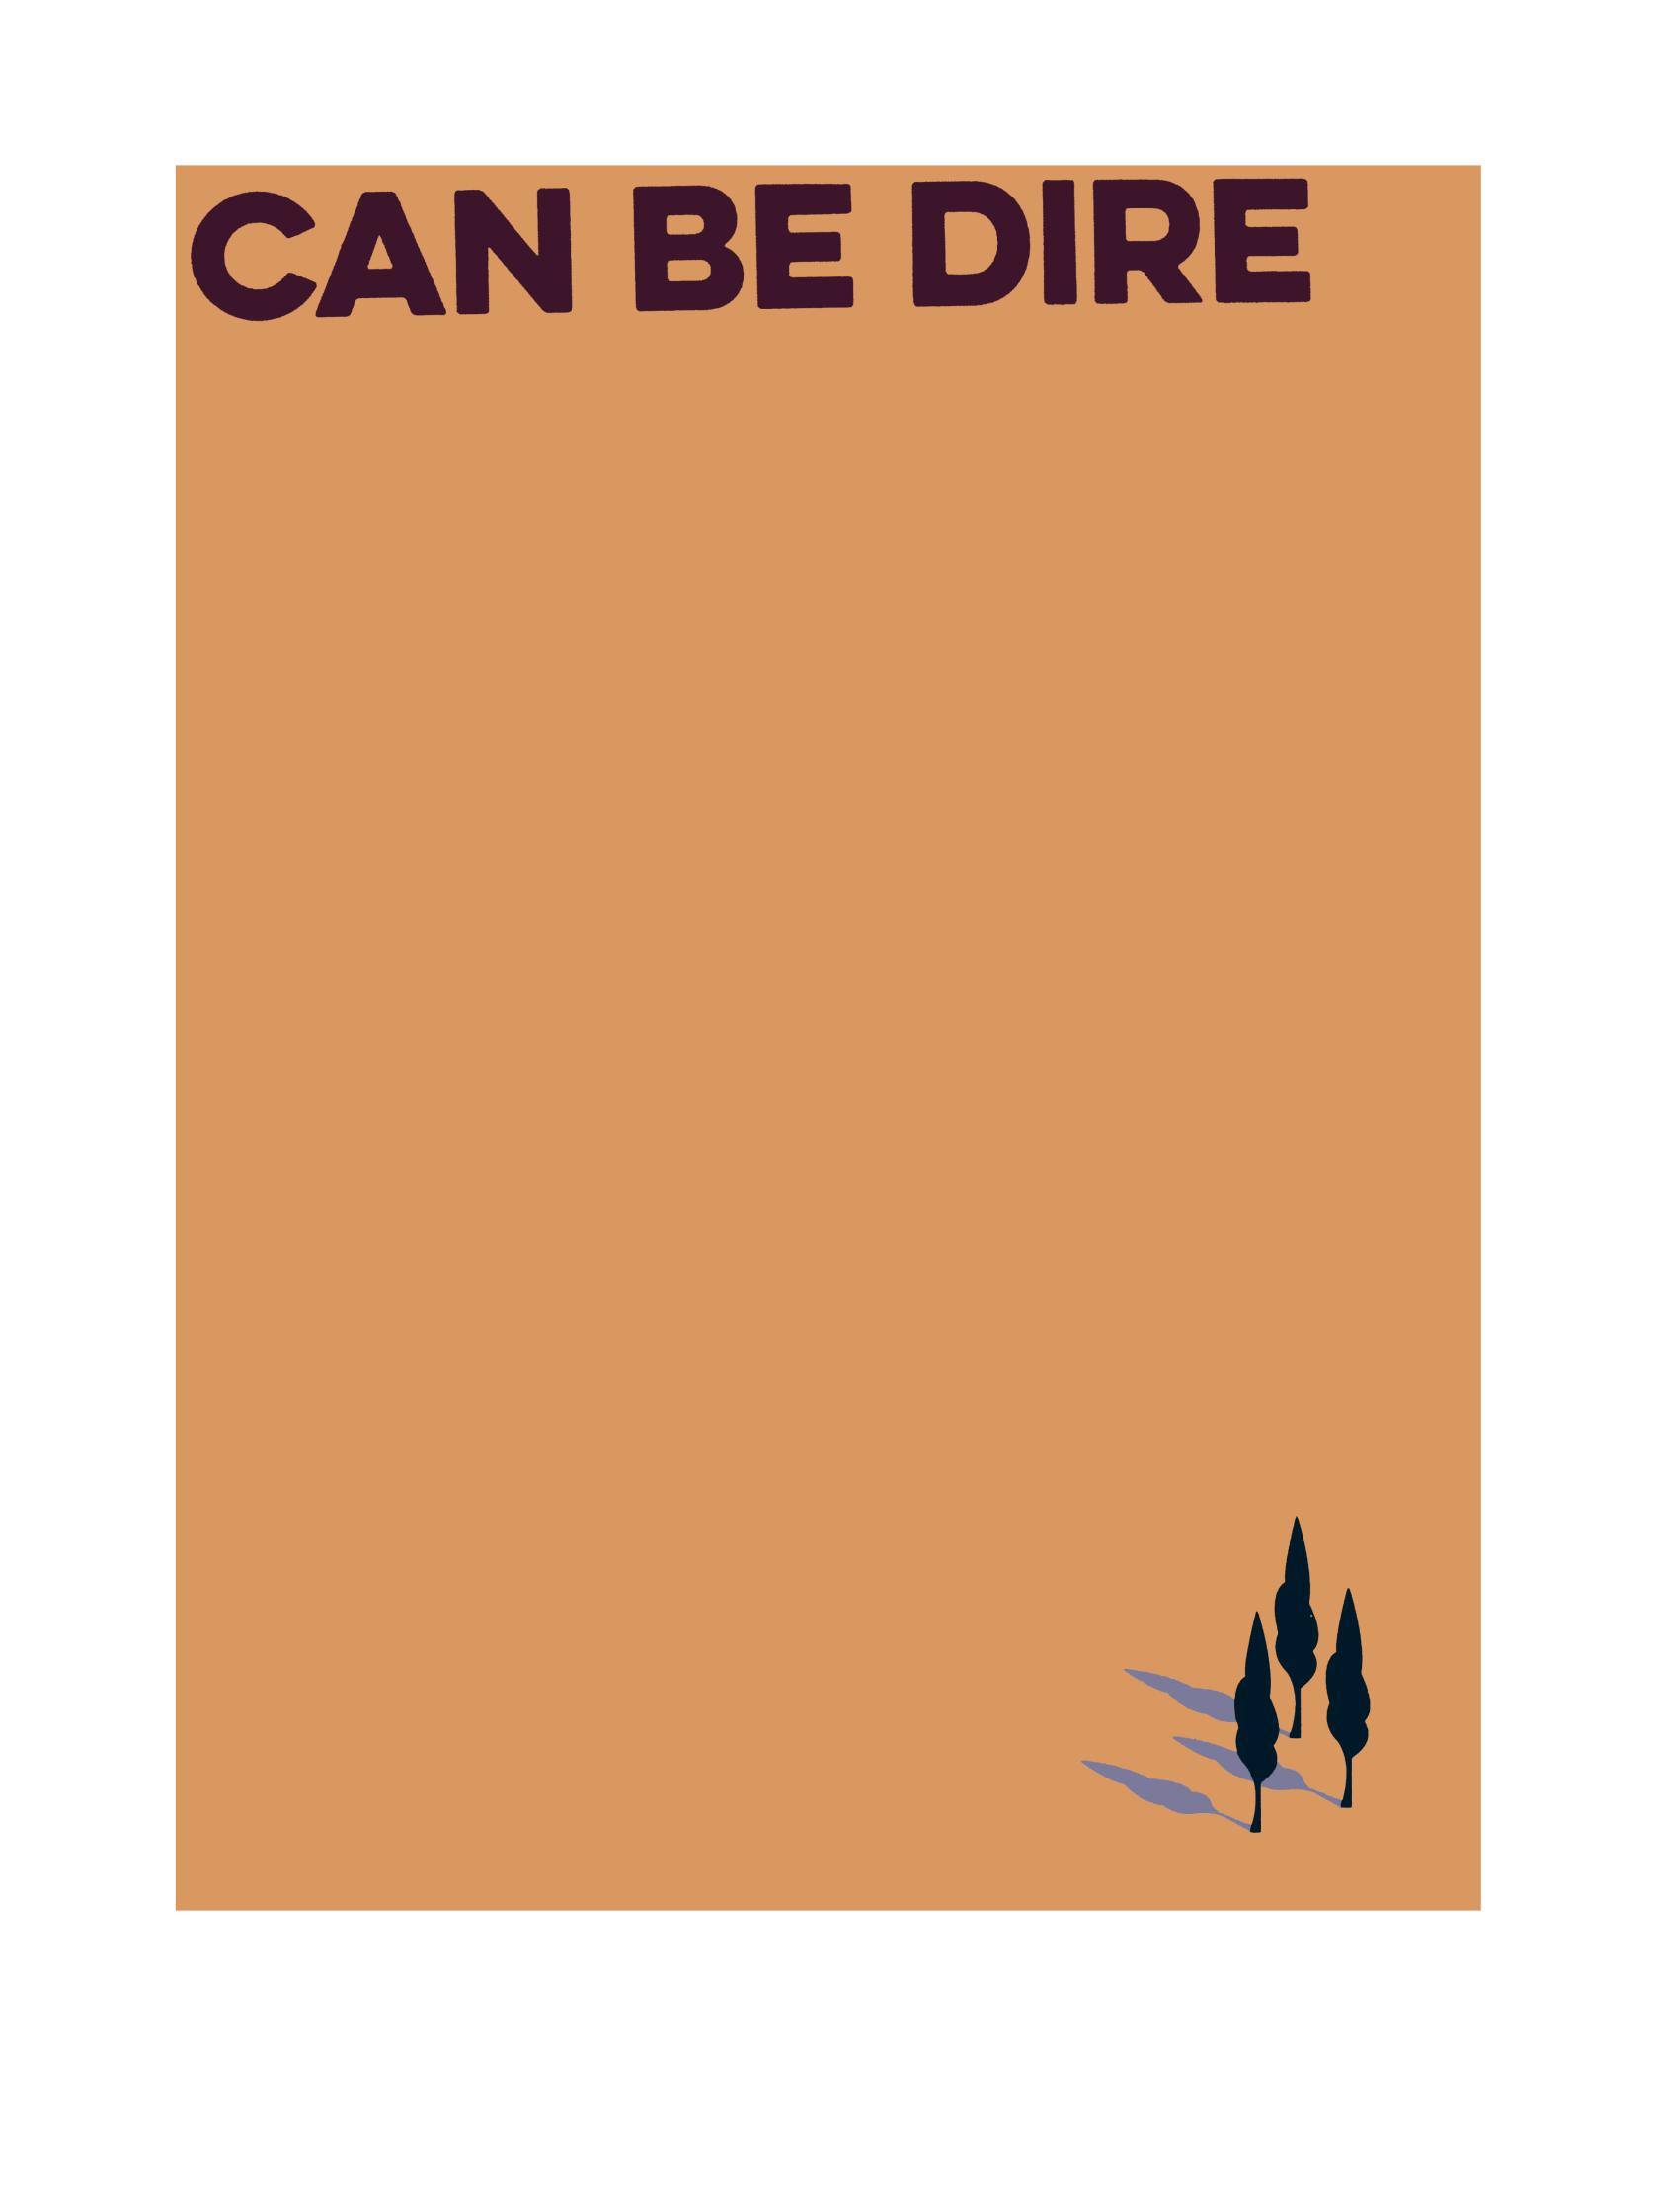 CanBeDire.jpg